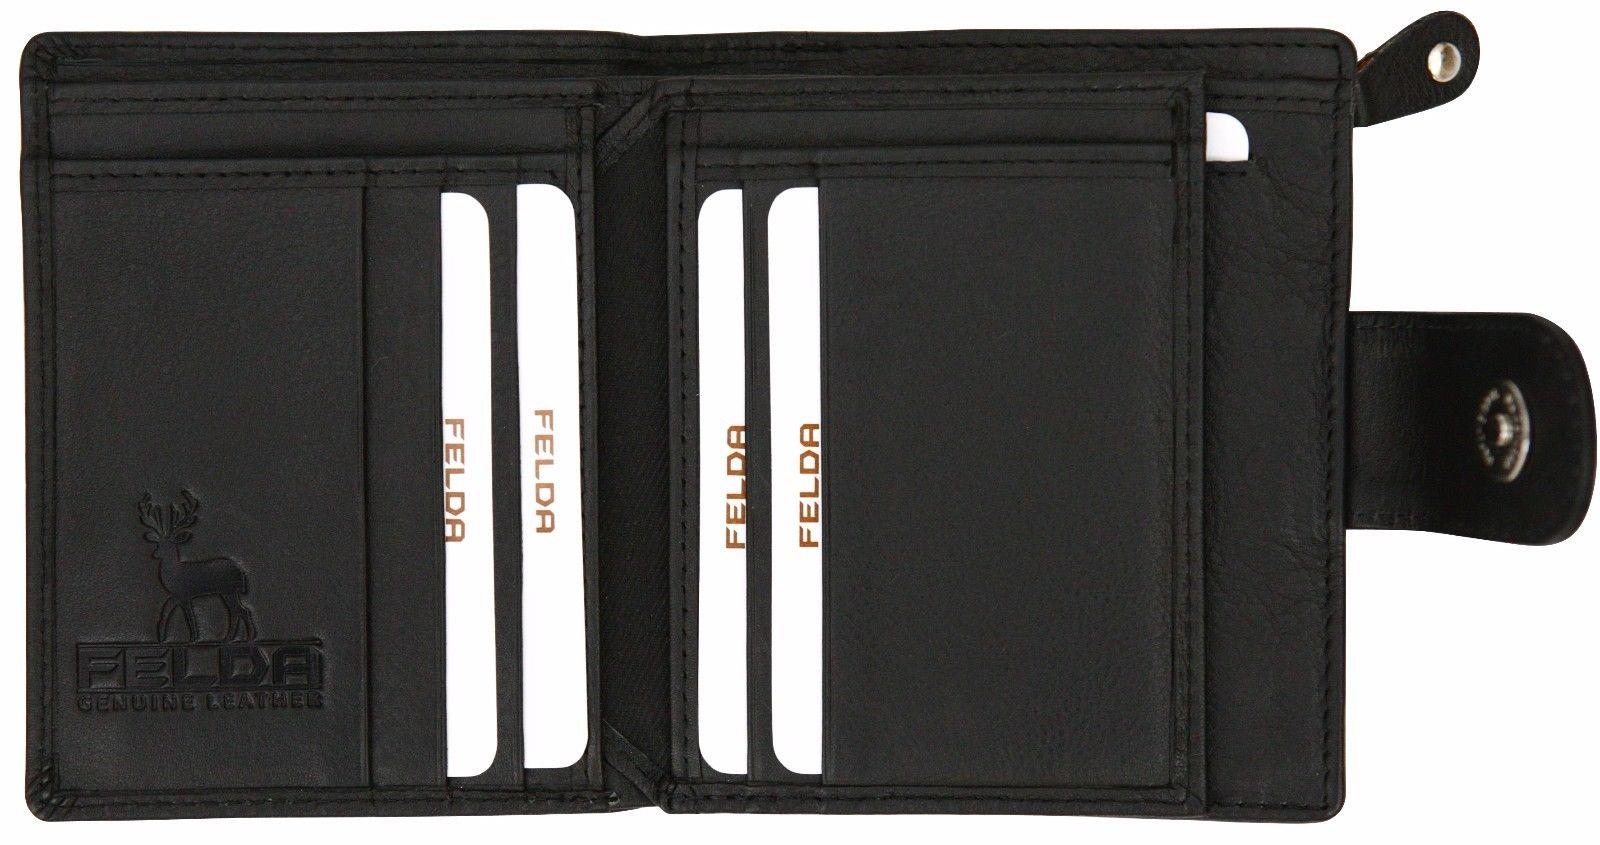 Felda-RFID-onorevoli-MEDAGLIA-amp-Card-Purse-Wallet-Genuine-Leather-Multi-SOFT-BOX-REGALO miniatura 13